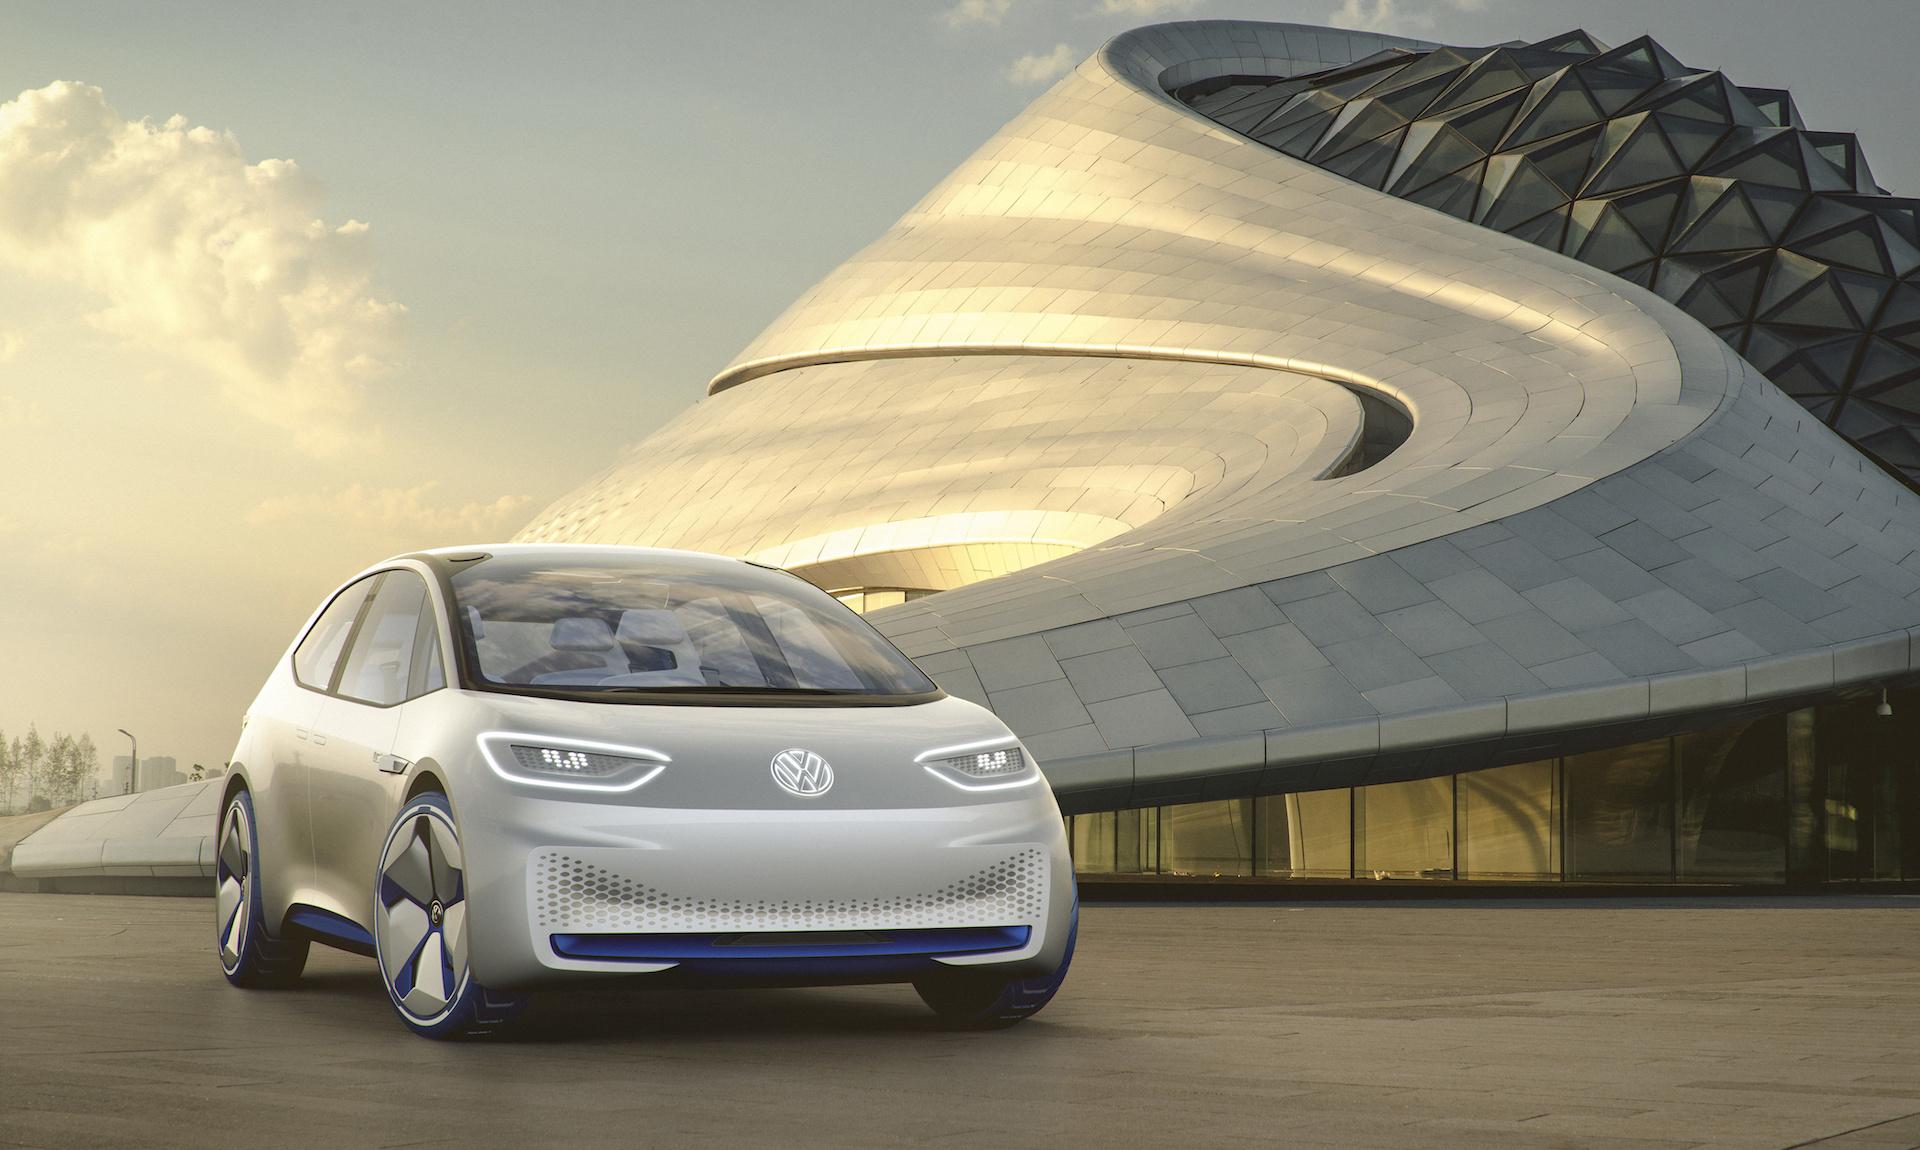 Koncept vozu Volkswagen ID